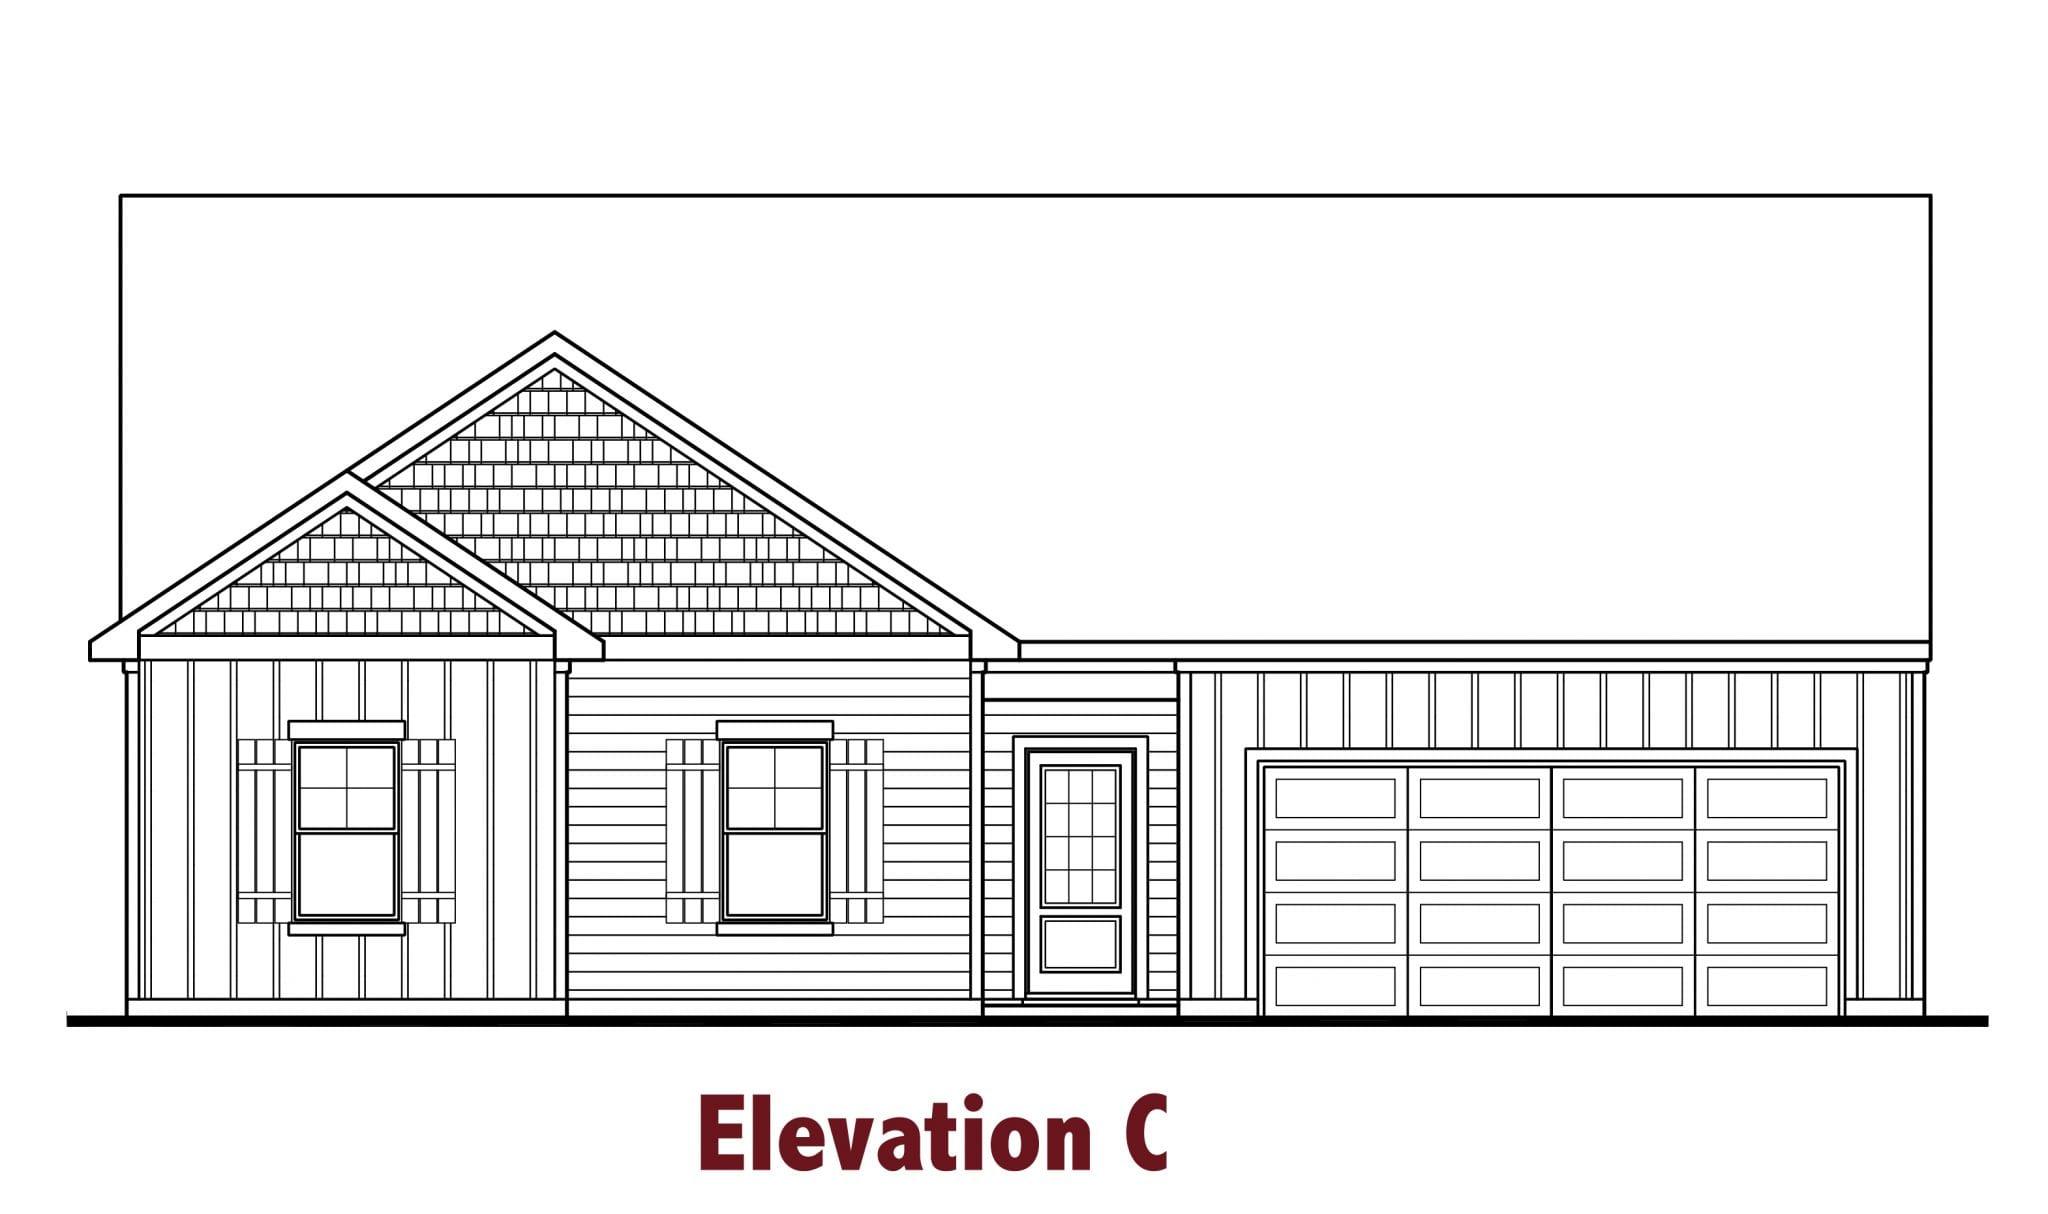 Magnolia elevations Image